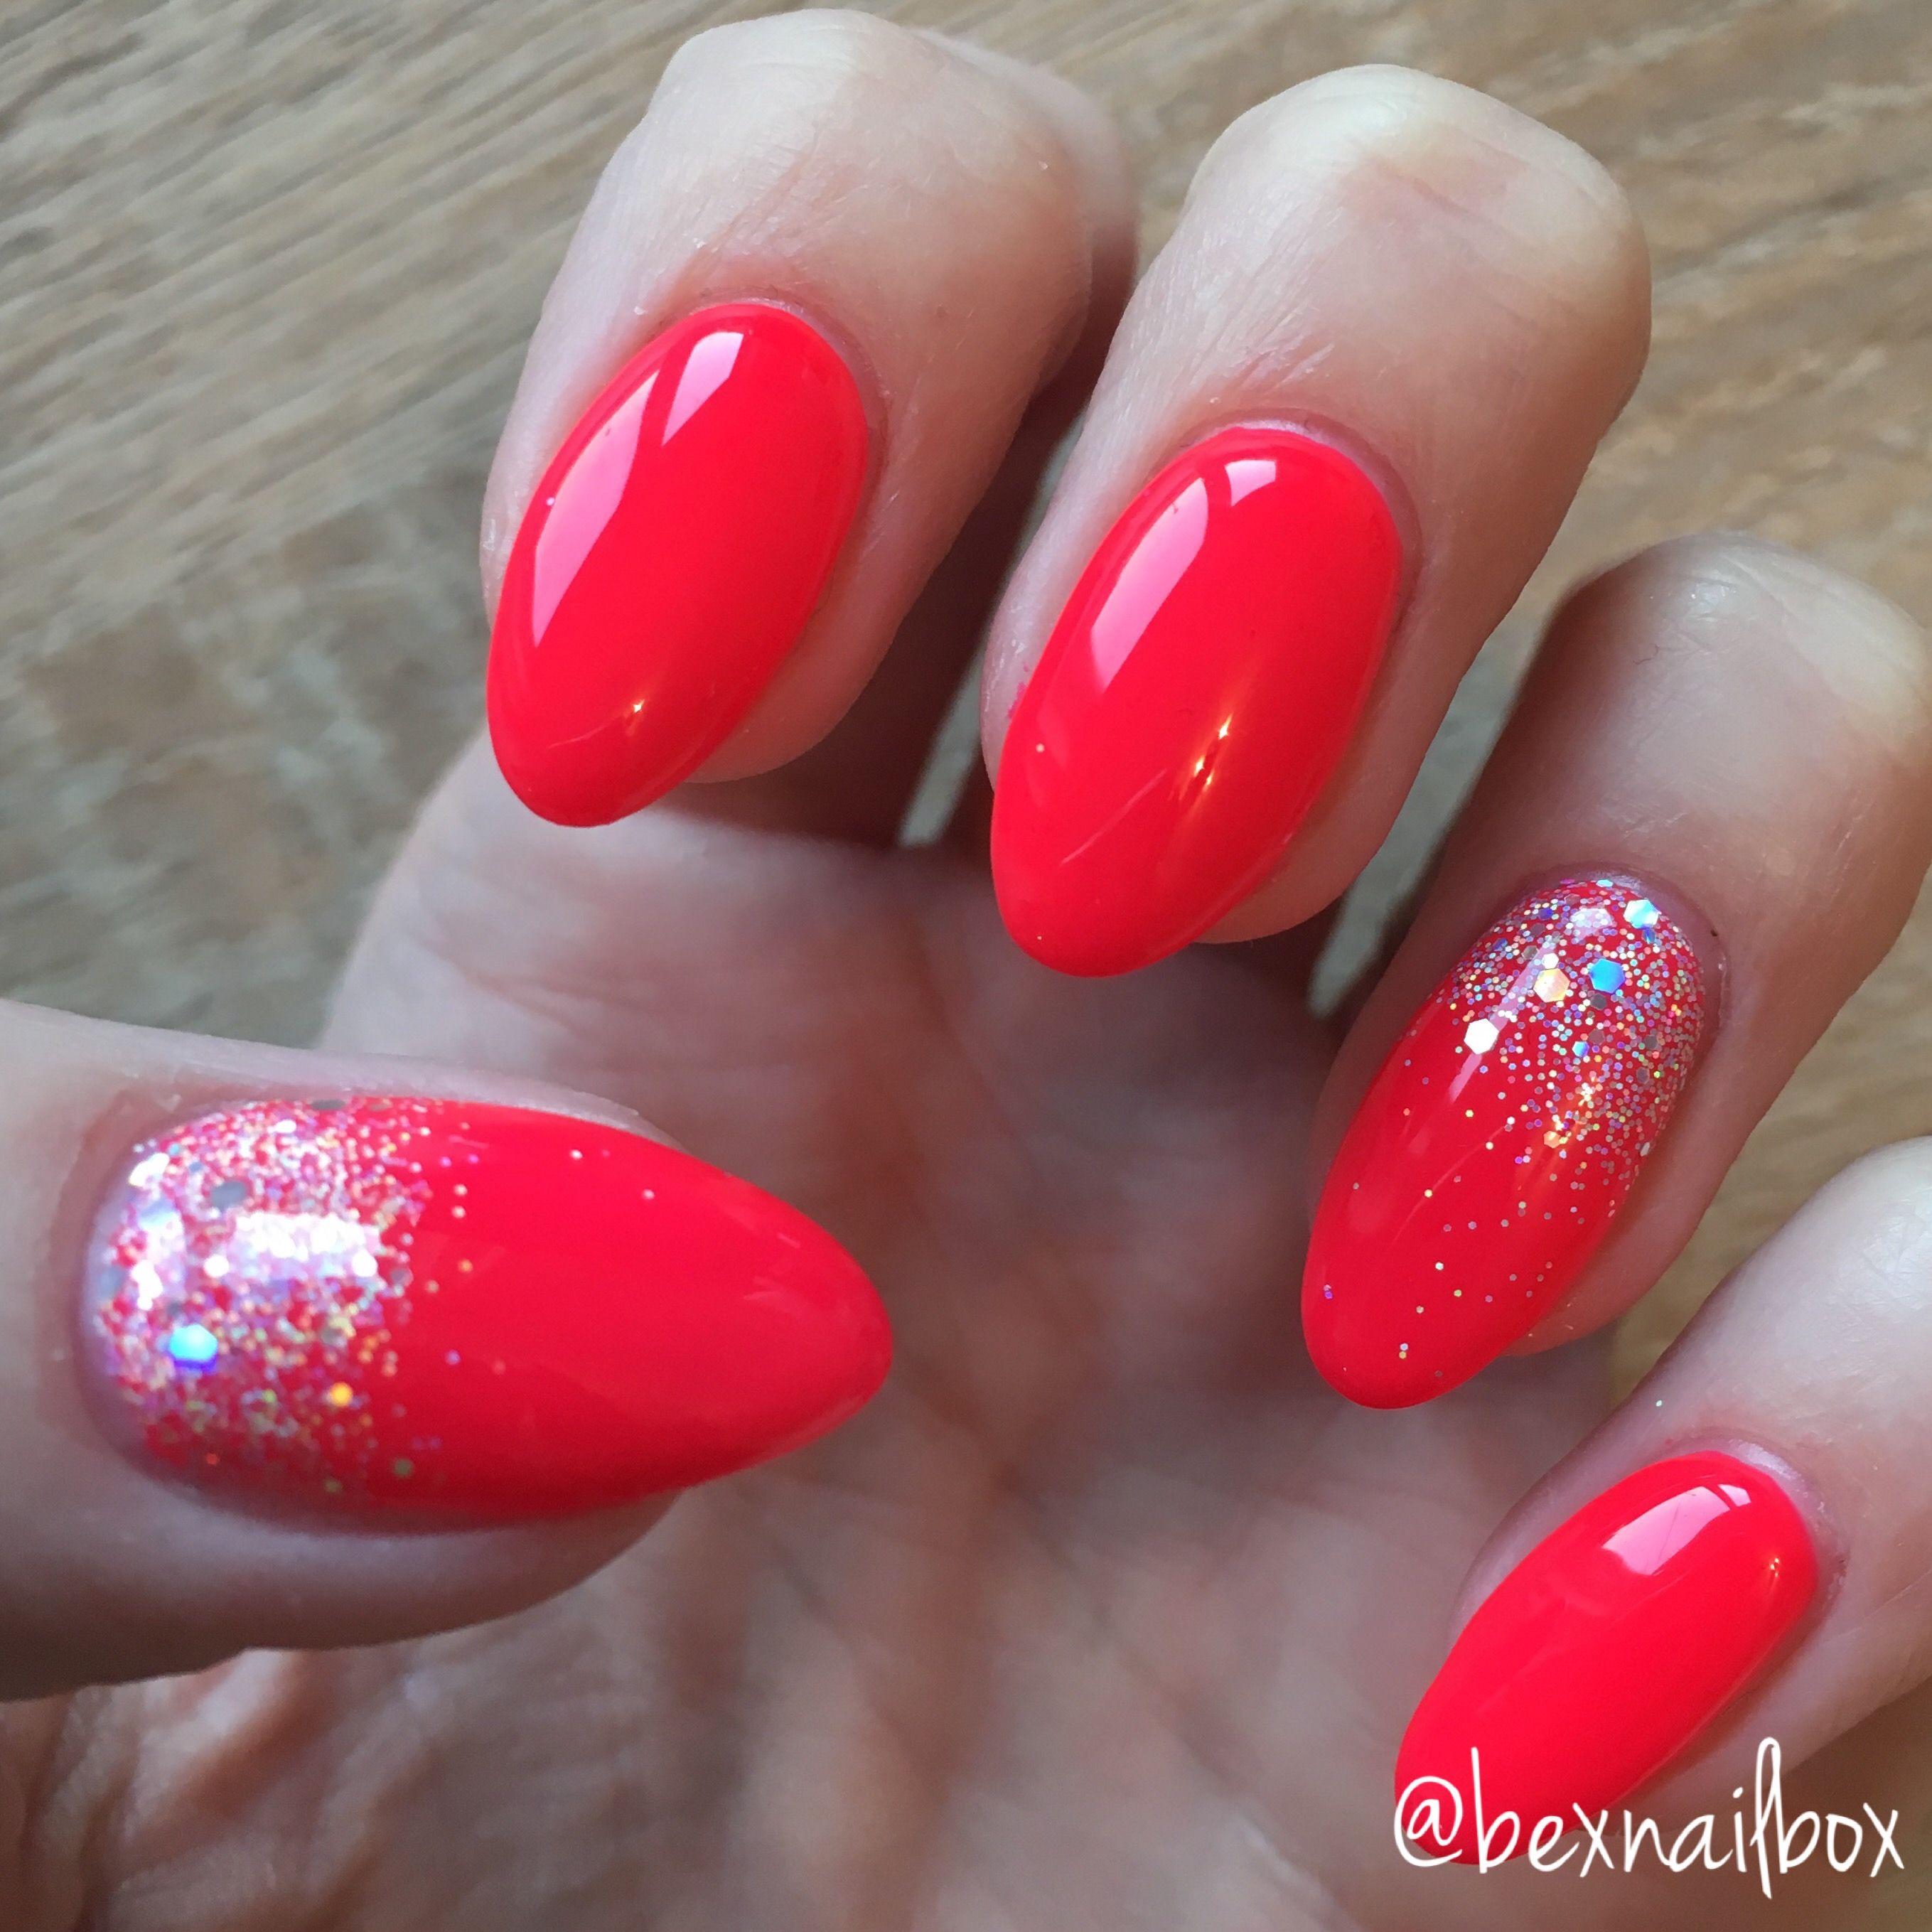 Bluesky Polish - Neon 25 Fruit Twist Magpie Glitter - Tara #nails ...